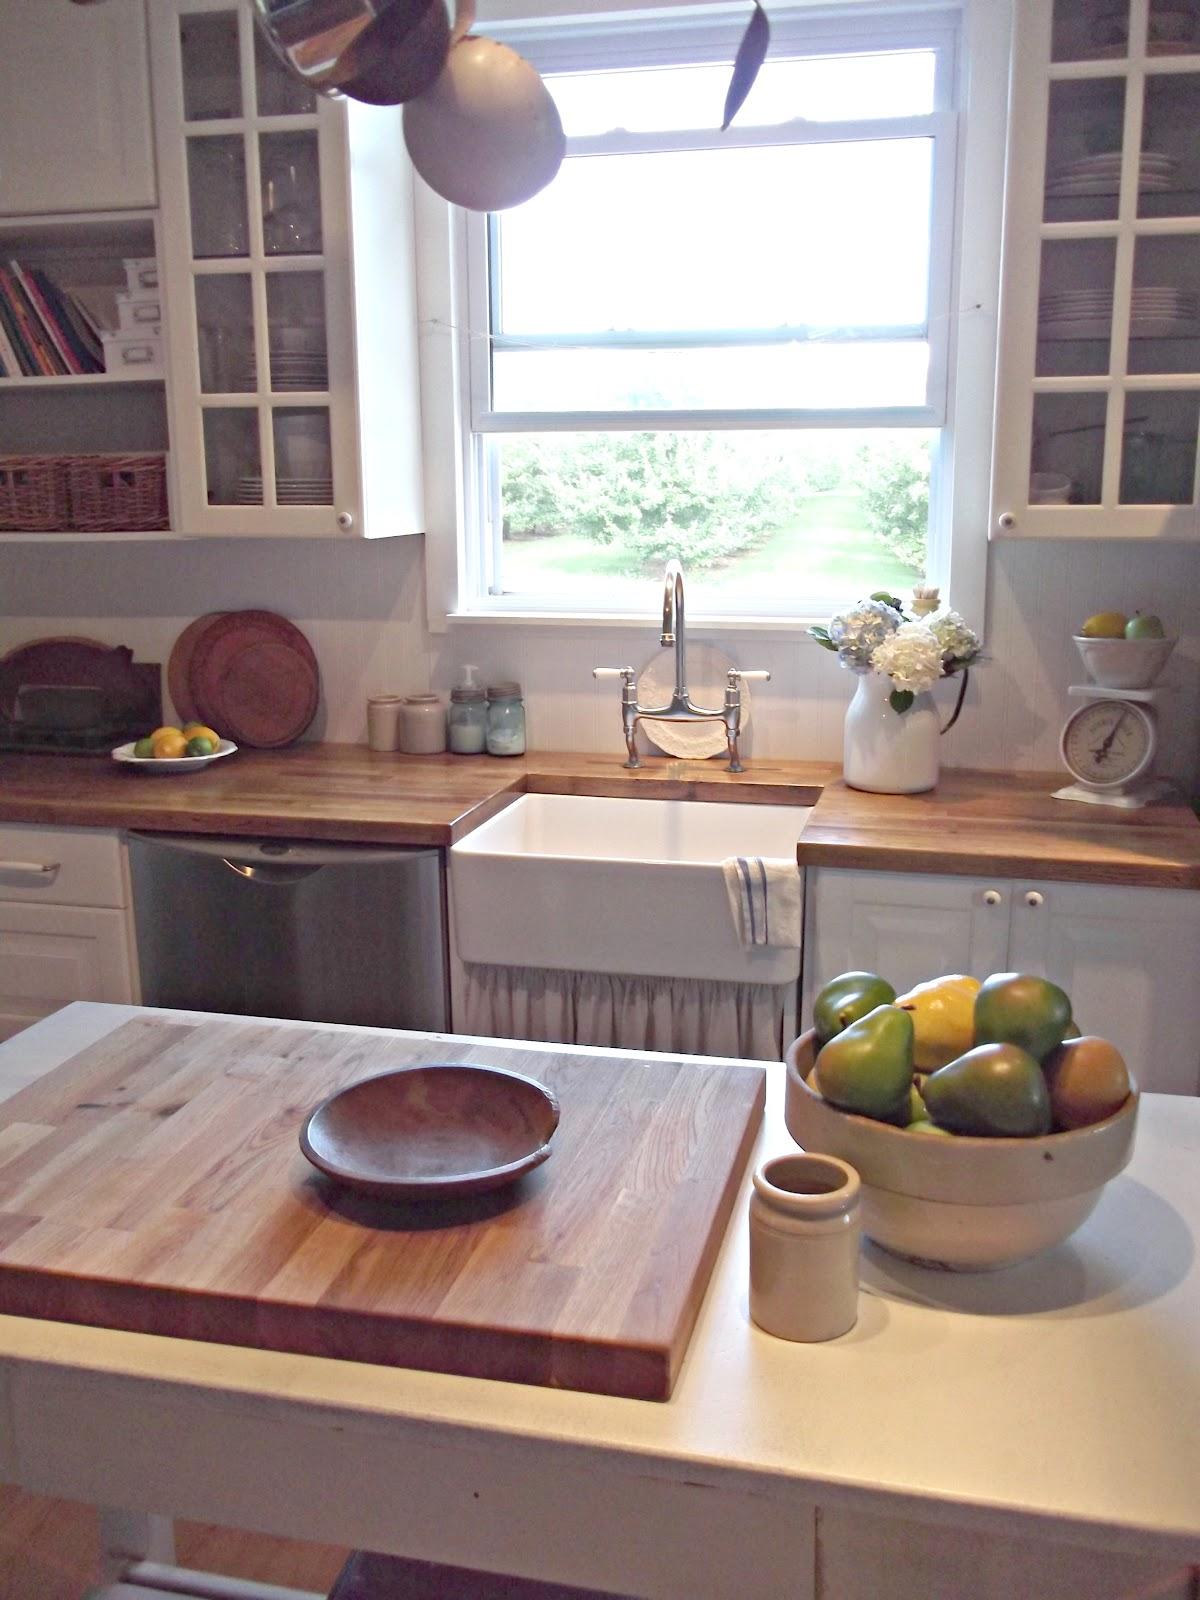 Rustic Farmhouse: A Farm Style Sink on Farmhouse Rustic Kitchen  id=36639